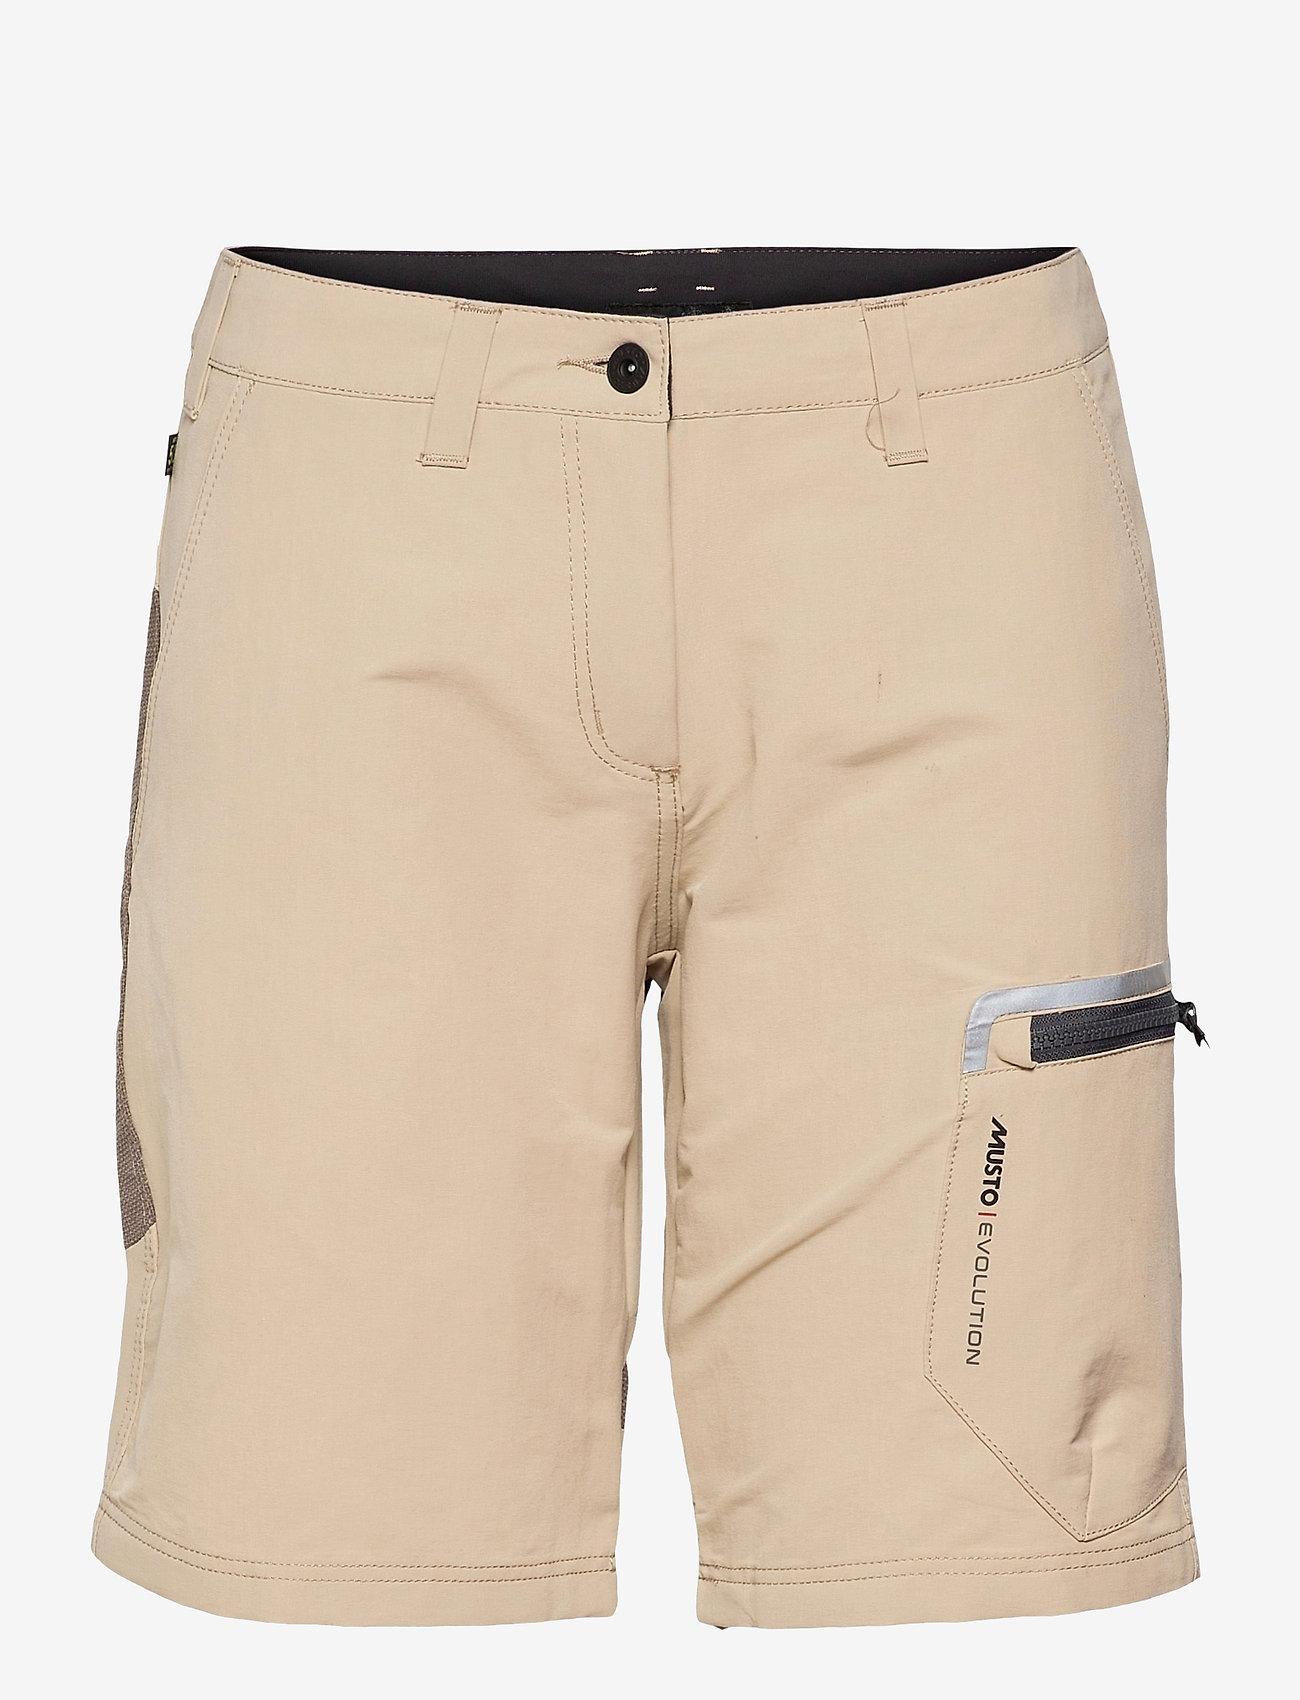 Musto - EVO PERFORMANCE SHORT 2.0 FW - training shorts - light stone - 0